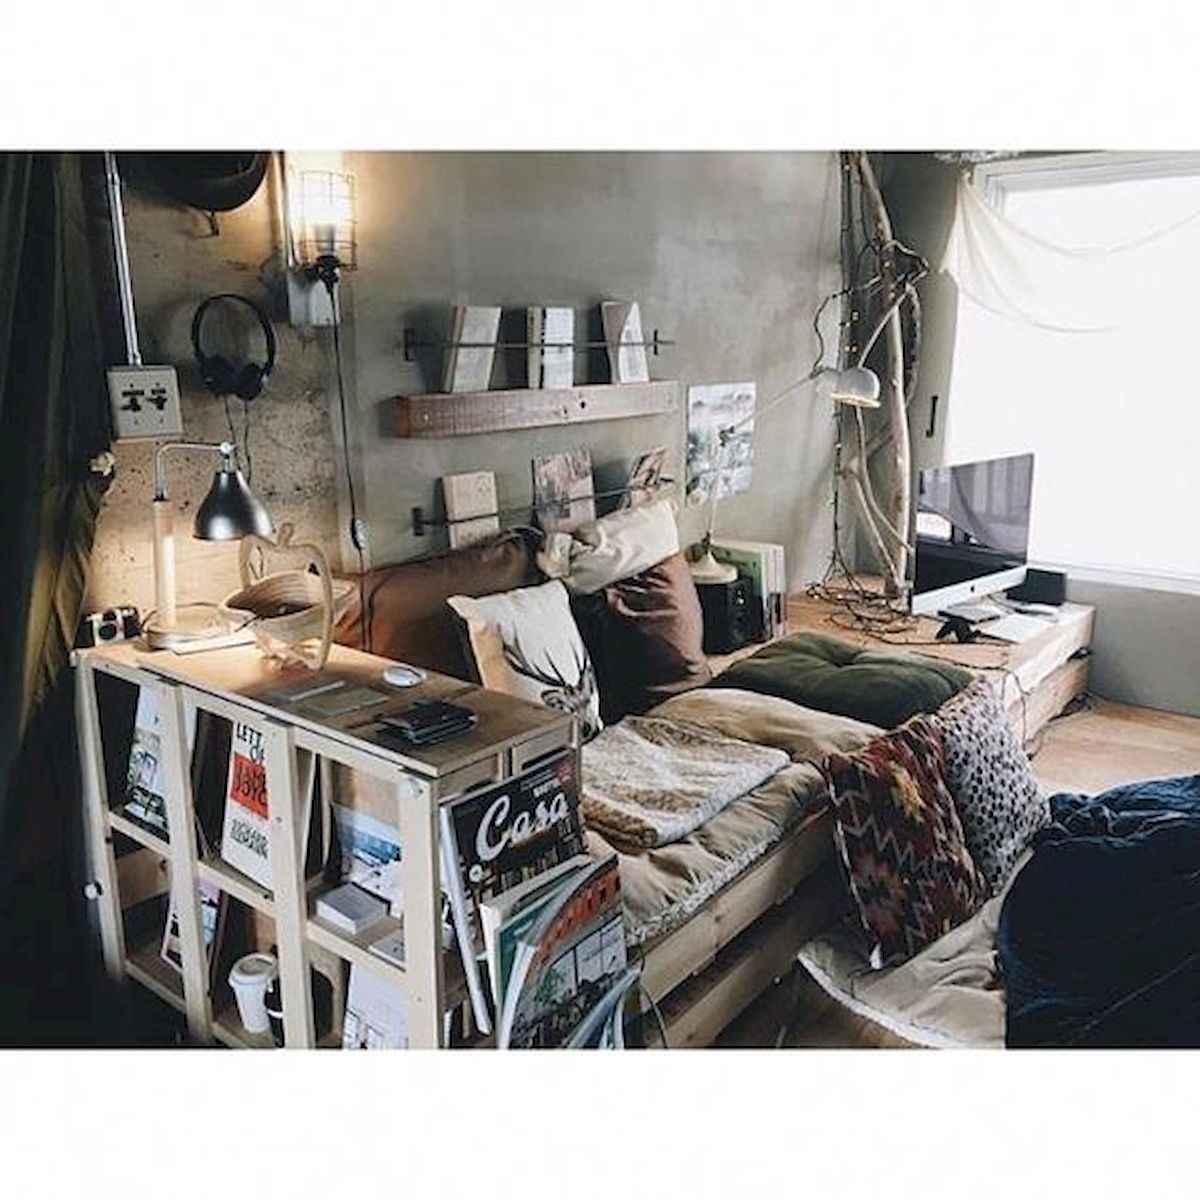 80 Fantastic Small Apartment Bedroom College Design Ideas and Decor (29)